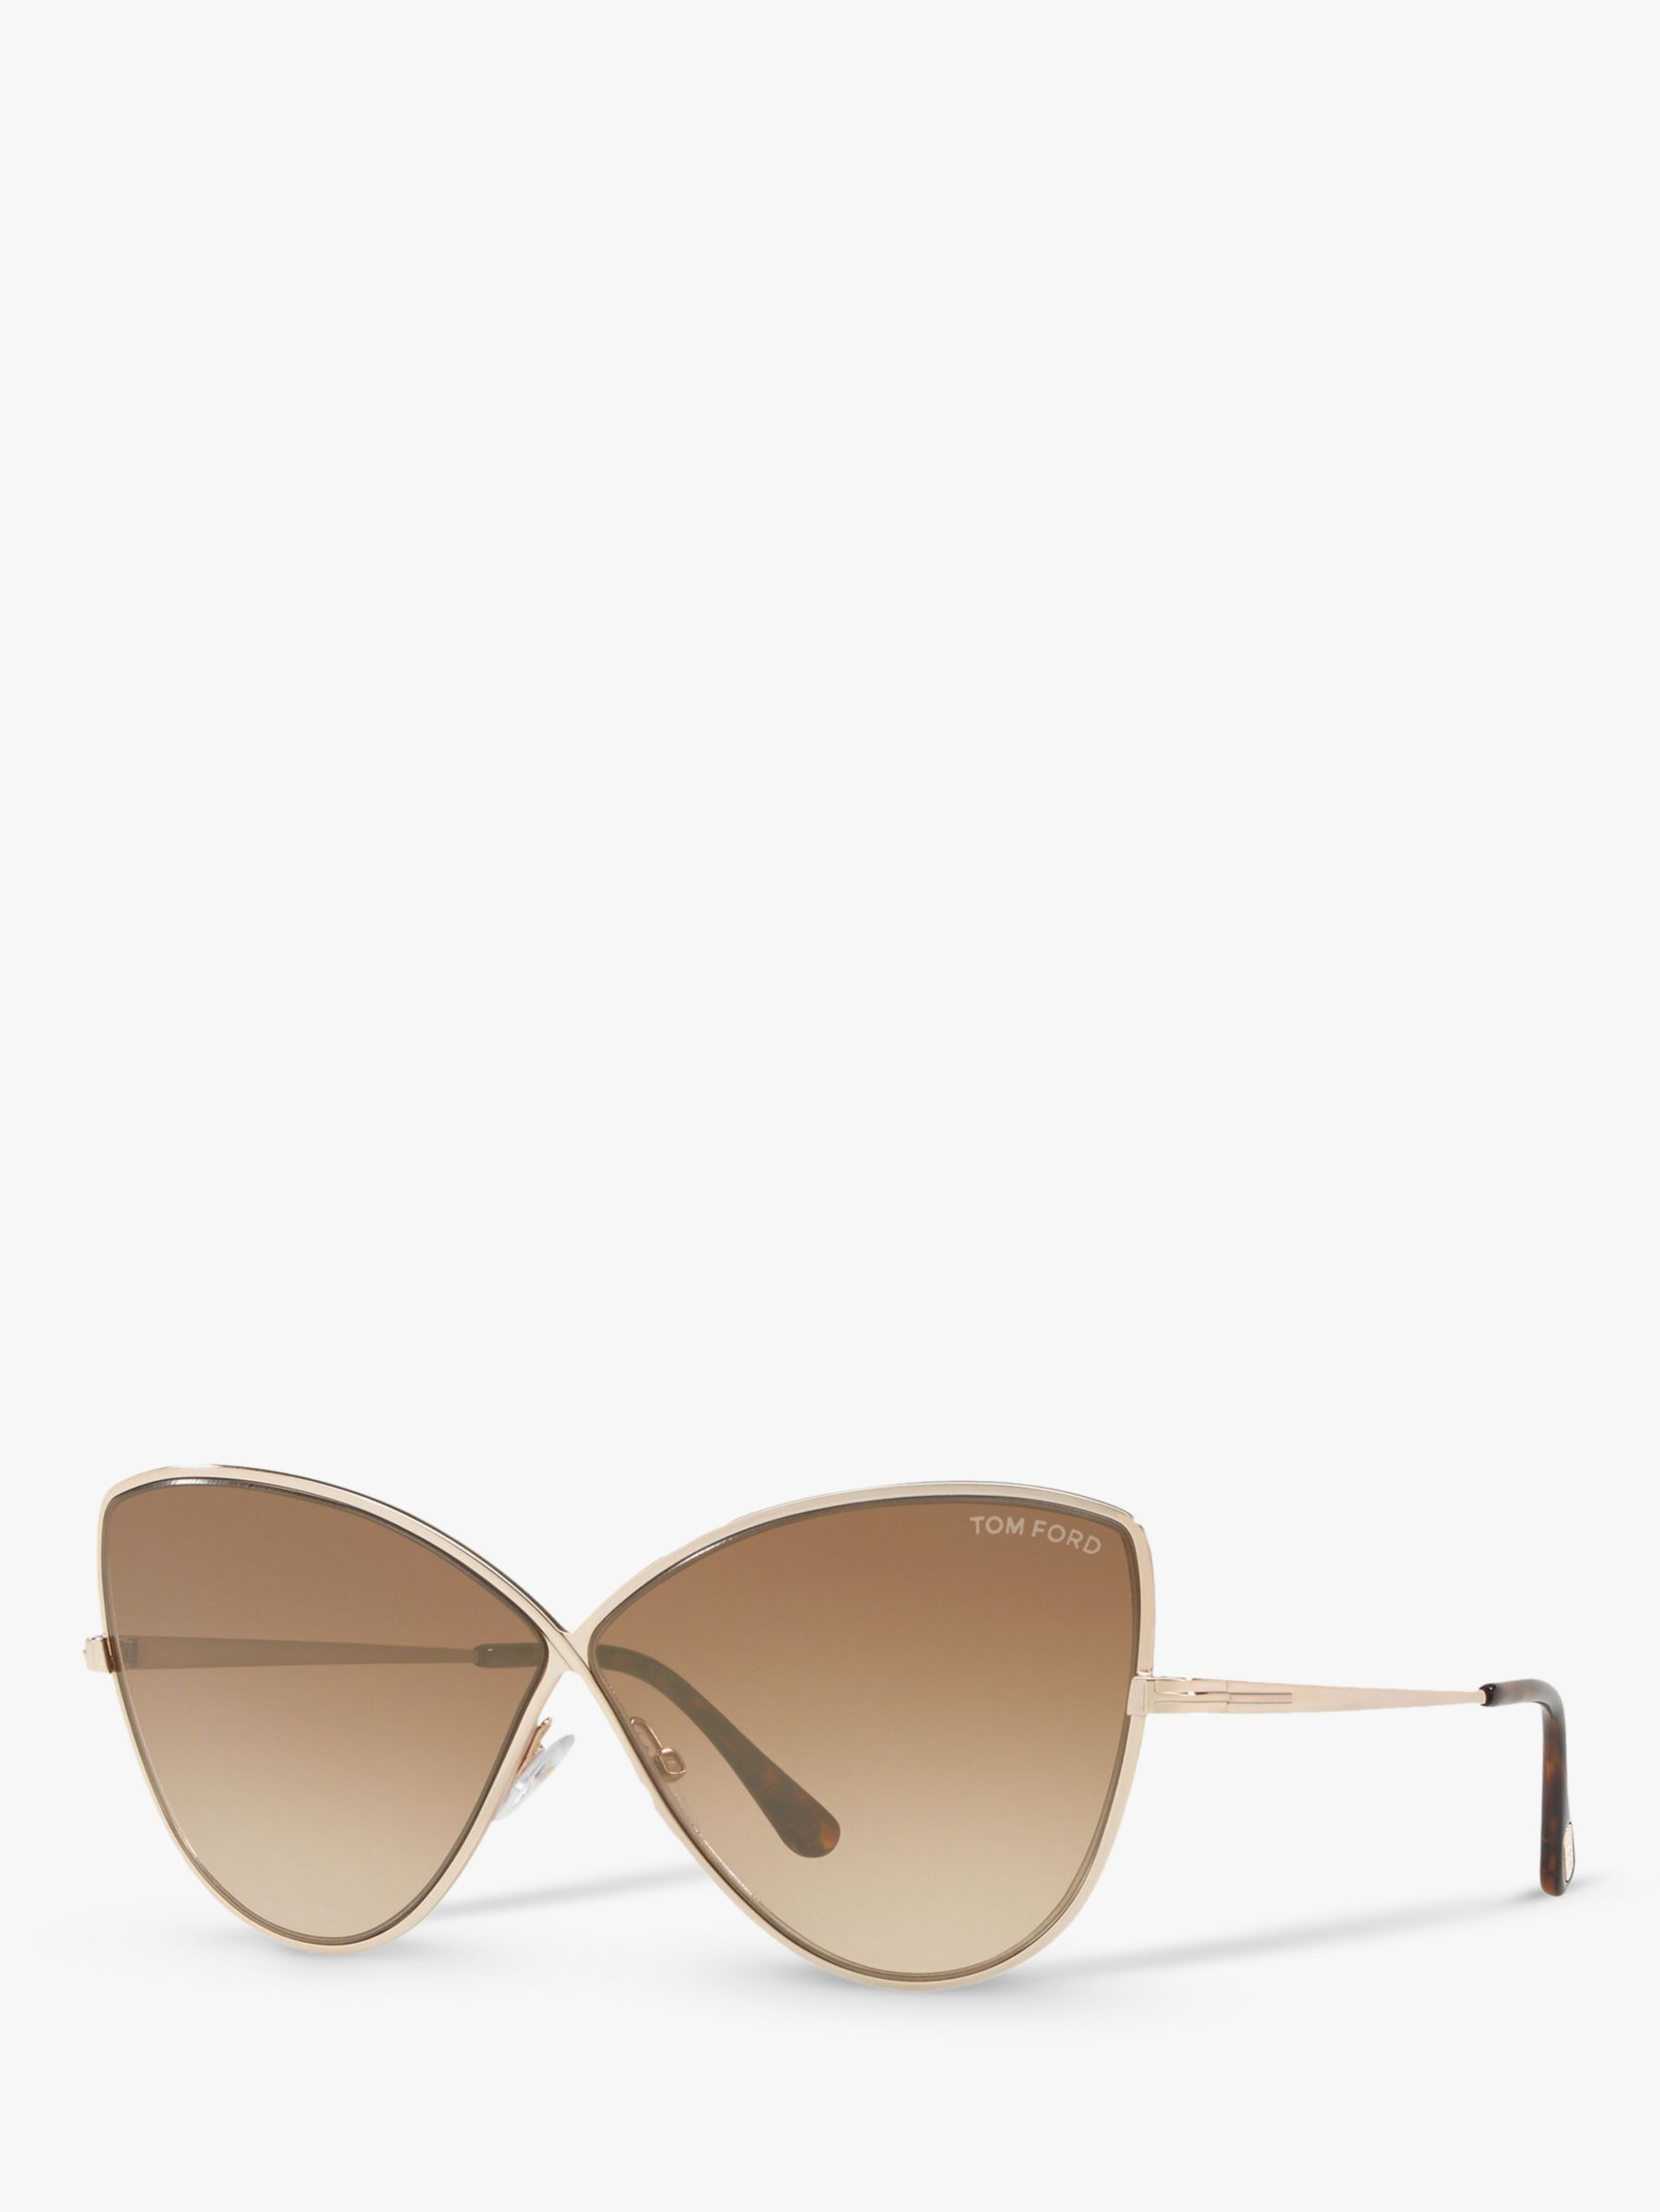 Tom Ford TOM FORD FT0569 Elise-02 Cat's Eye Sunglasses, Gold/Brown Gradient